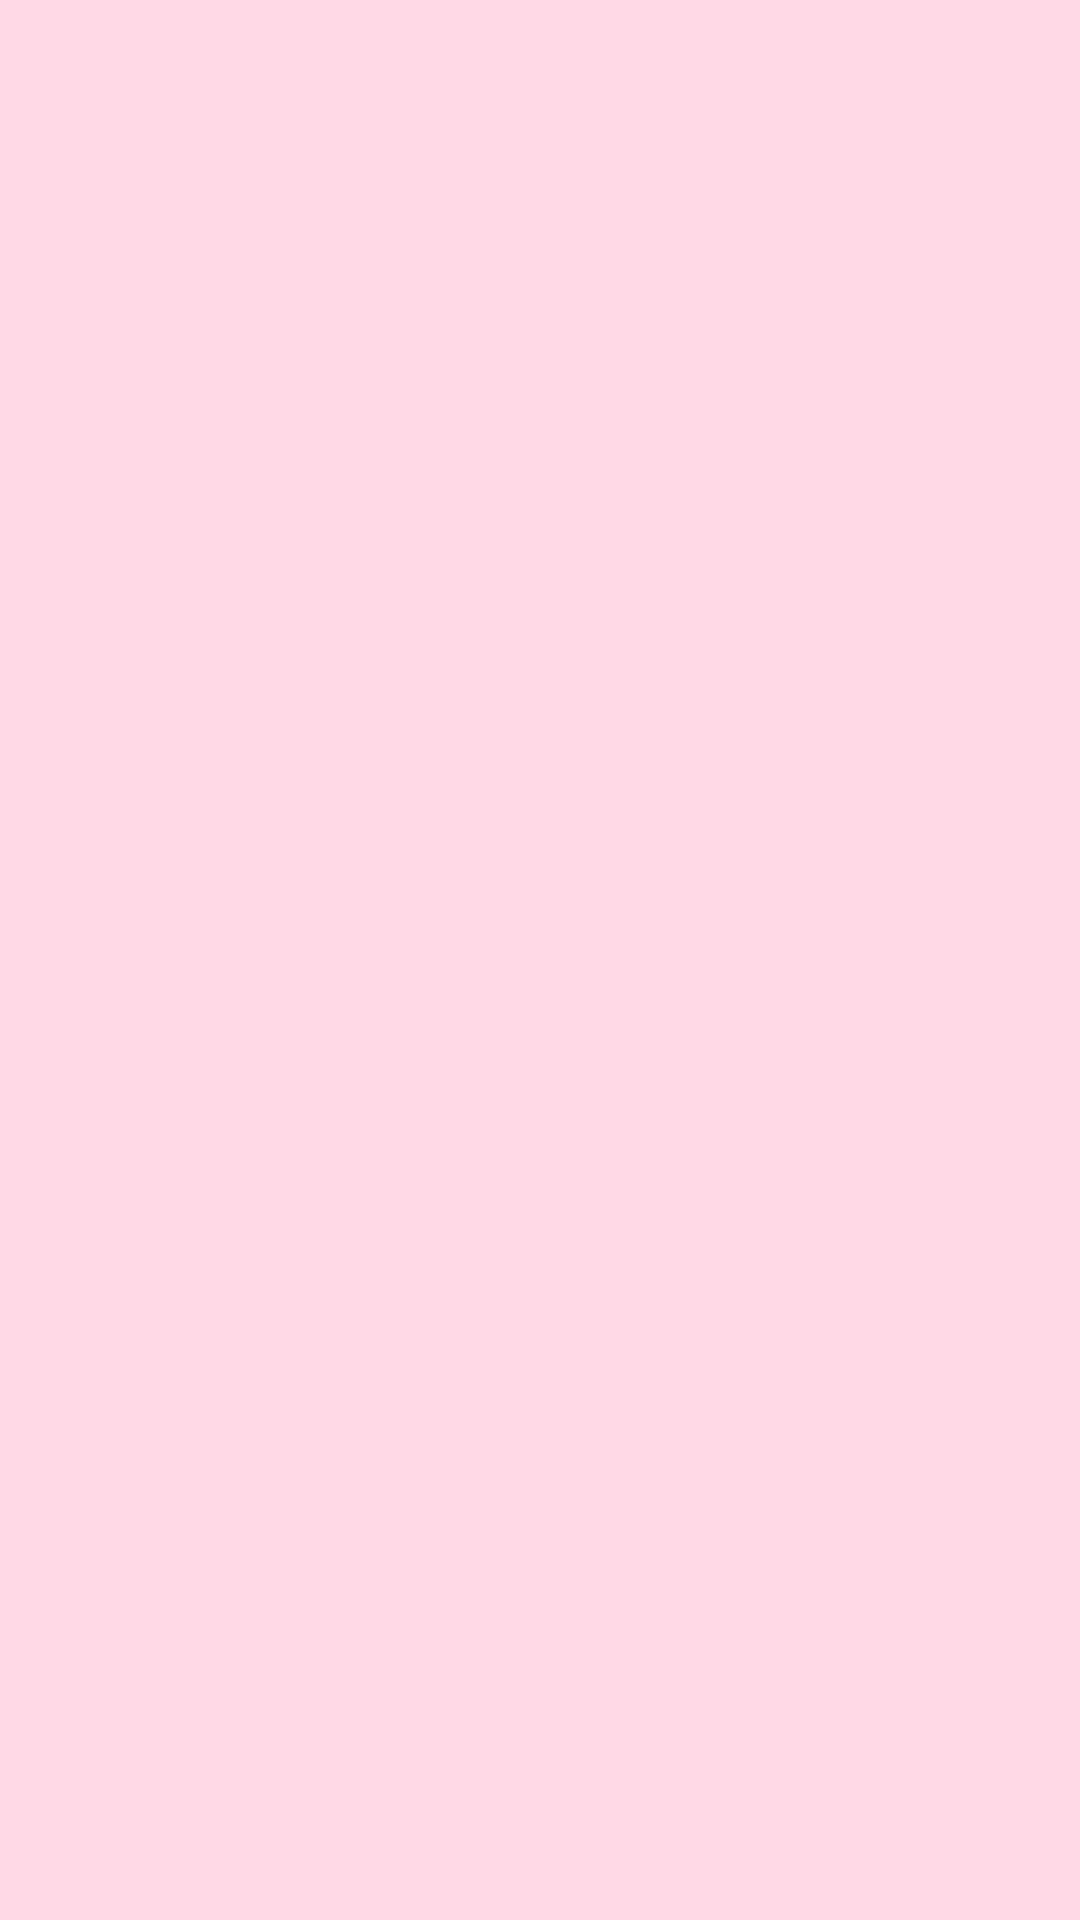 Color Pink Backgrounds - Wallpaper Cave |Plain Pink Backgrounds